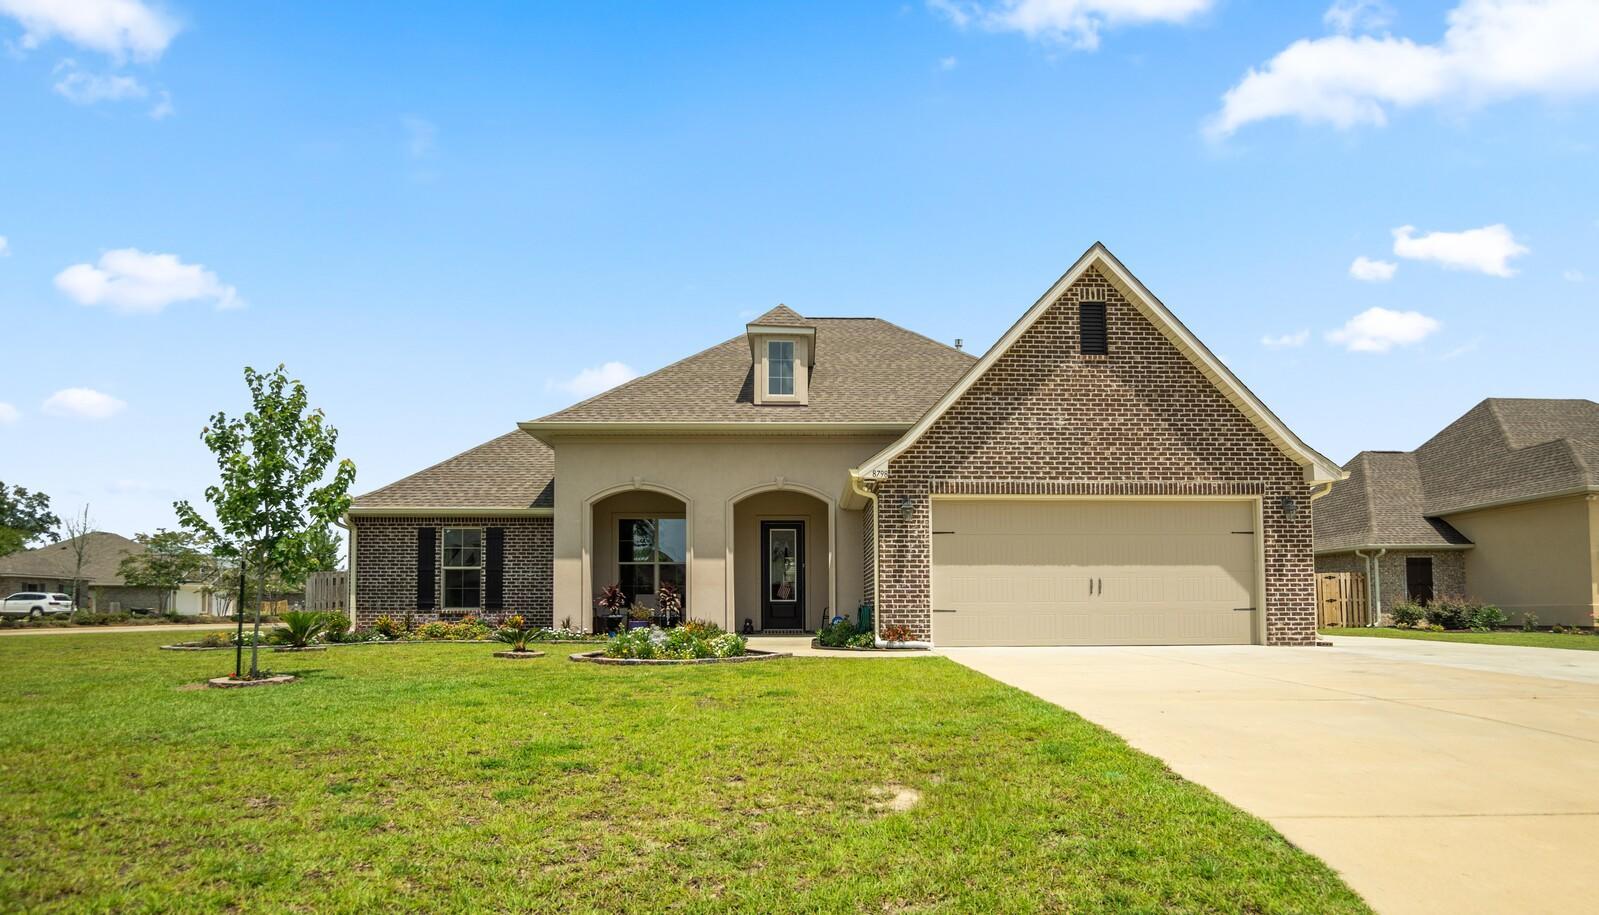 Photo of home for sale at 8798 Blake Evan, Pensacola FL